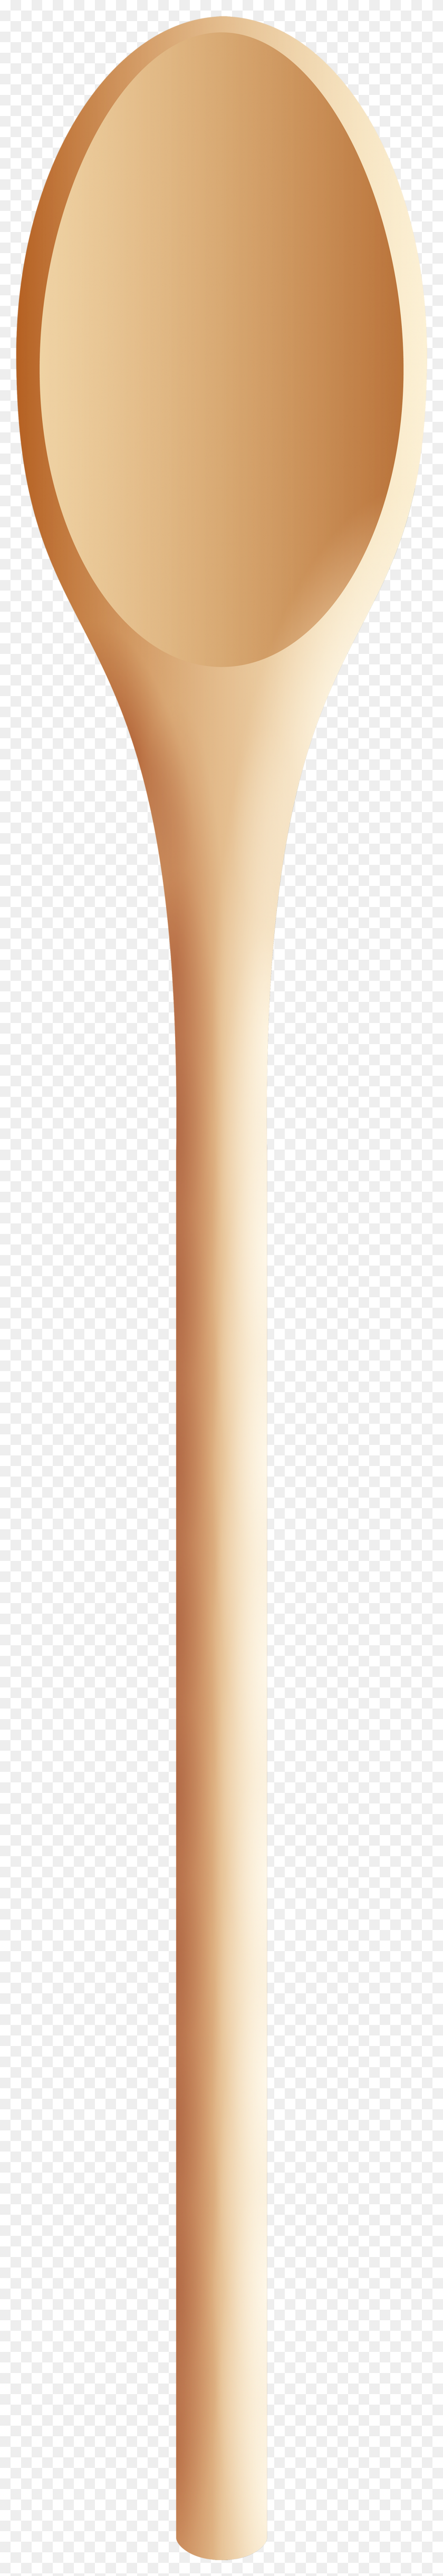 Spoon Clipart Wooden Spoon - Wooden Spoon Clipart